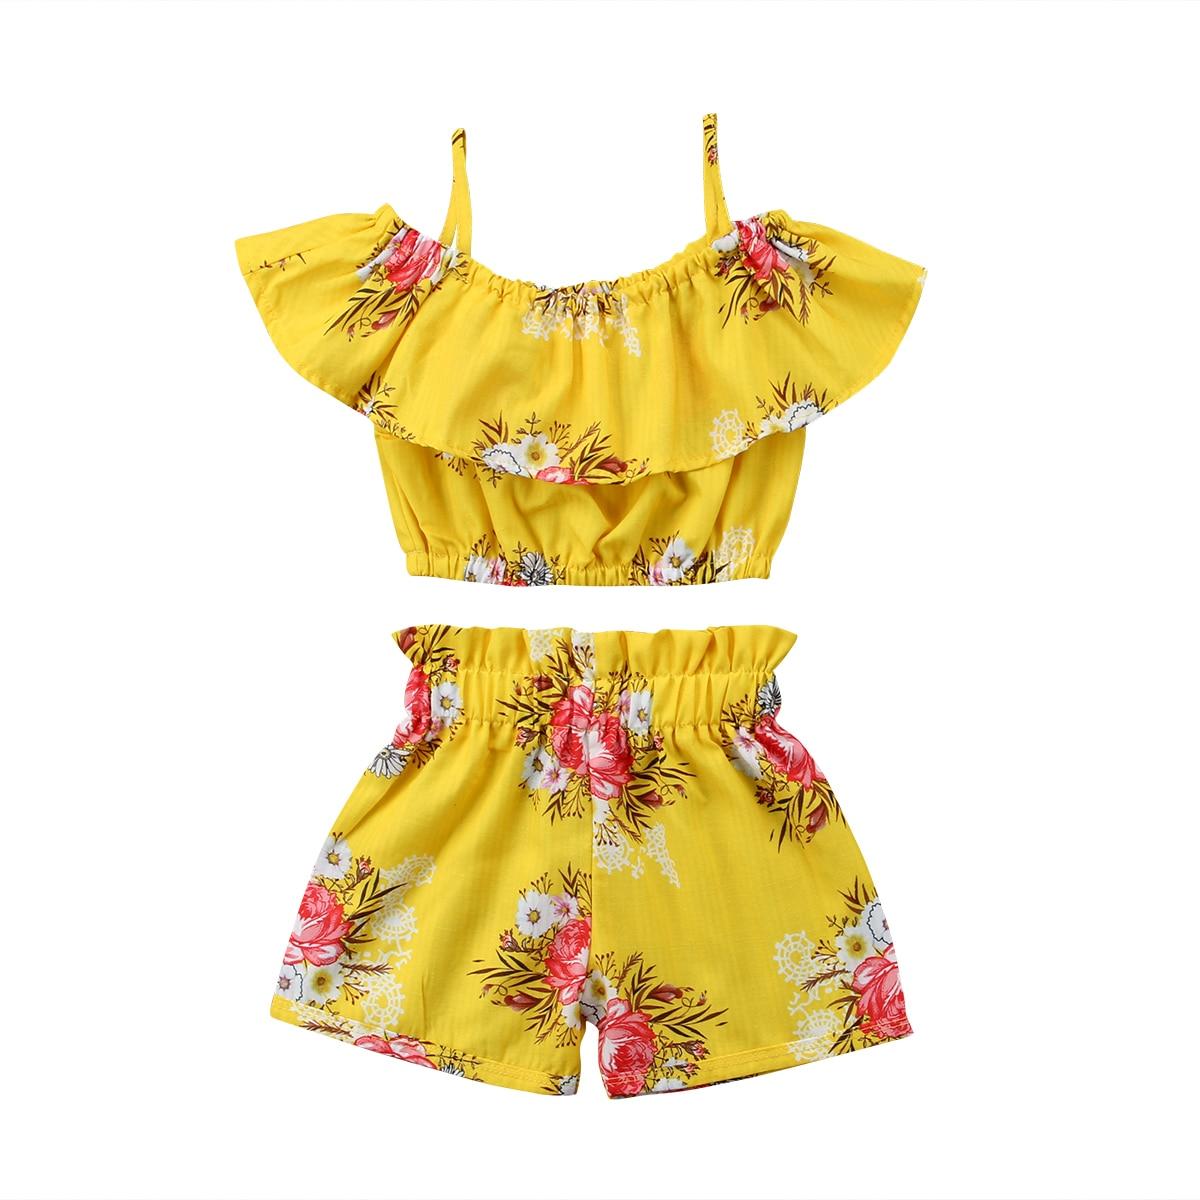 Baby Kids Girls Outfit Off Shoulder T-shirt Tops+Floral Short Skirt Clothes Set